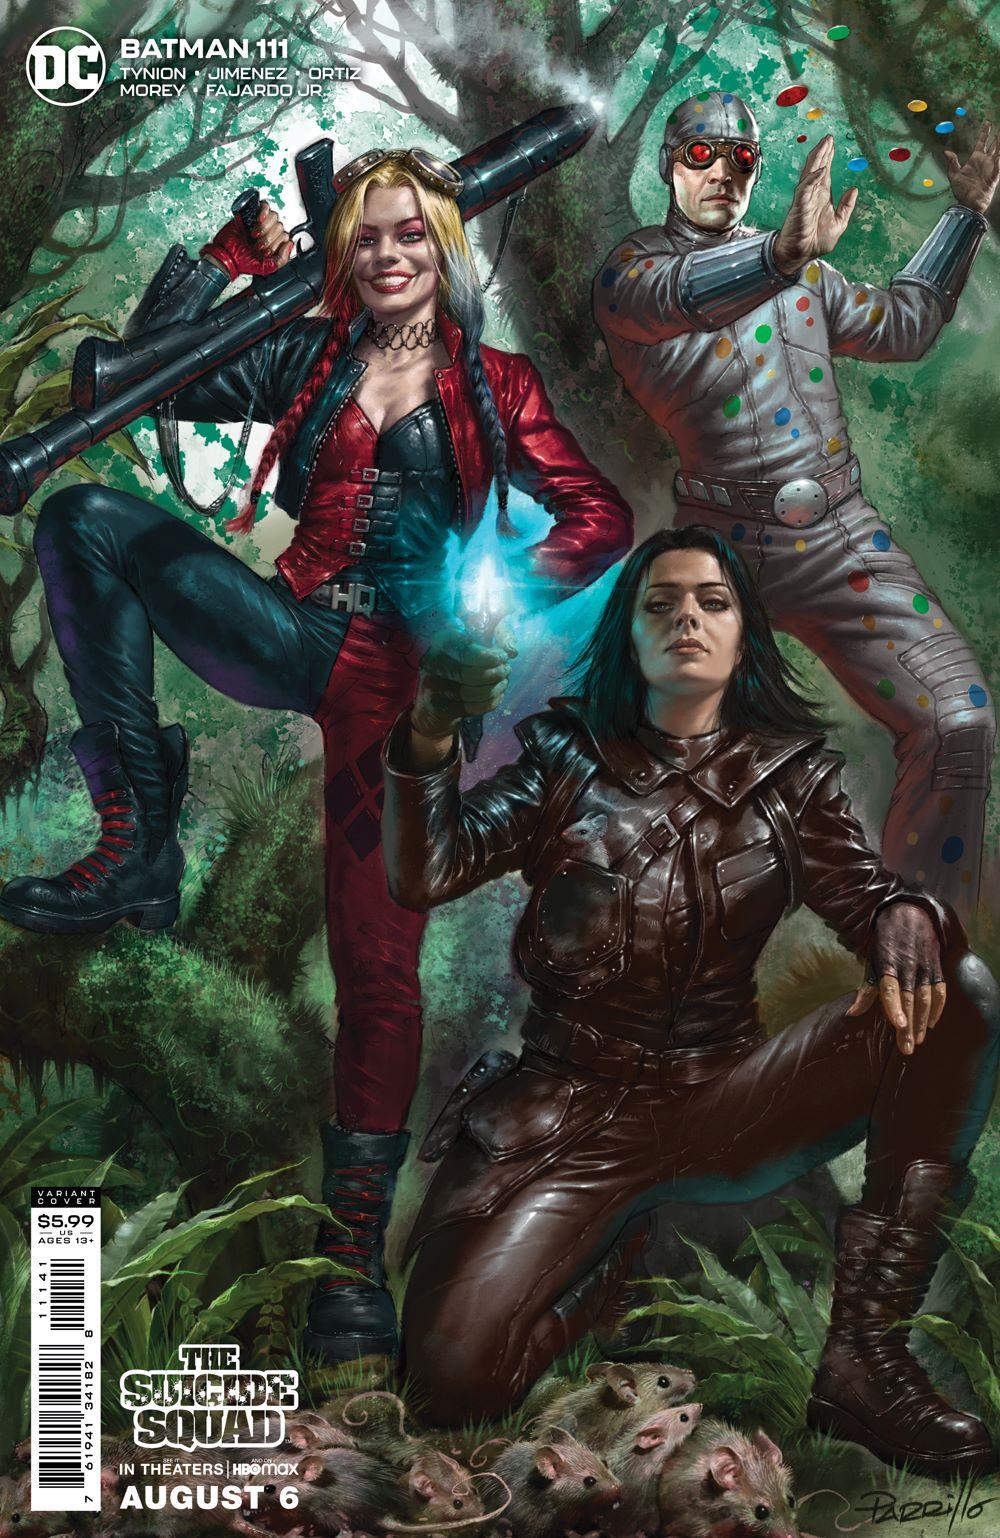 BM_Cv111_SSMOVIE_var_11141 DC Comics August 2021 Solicitations